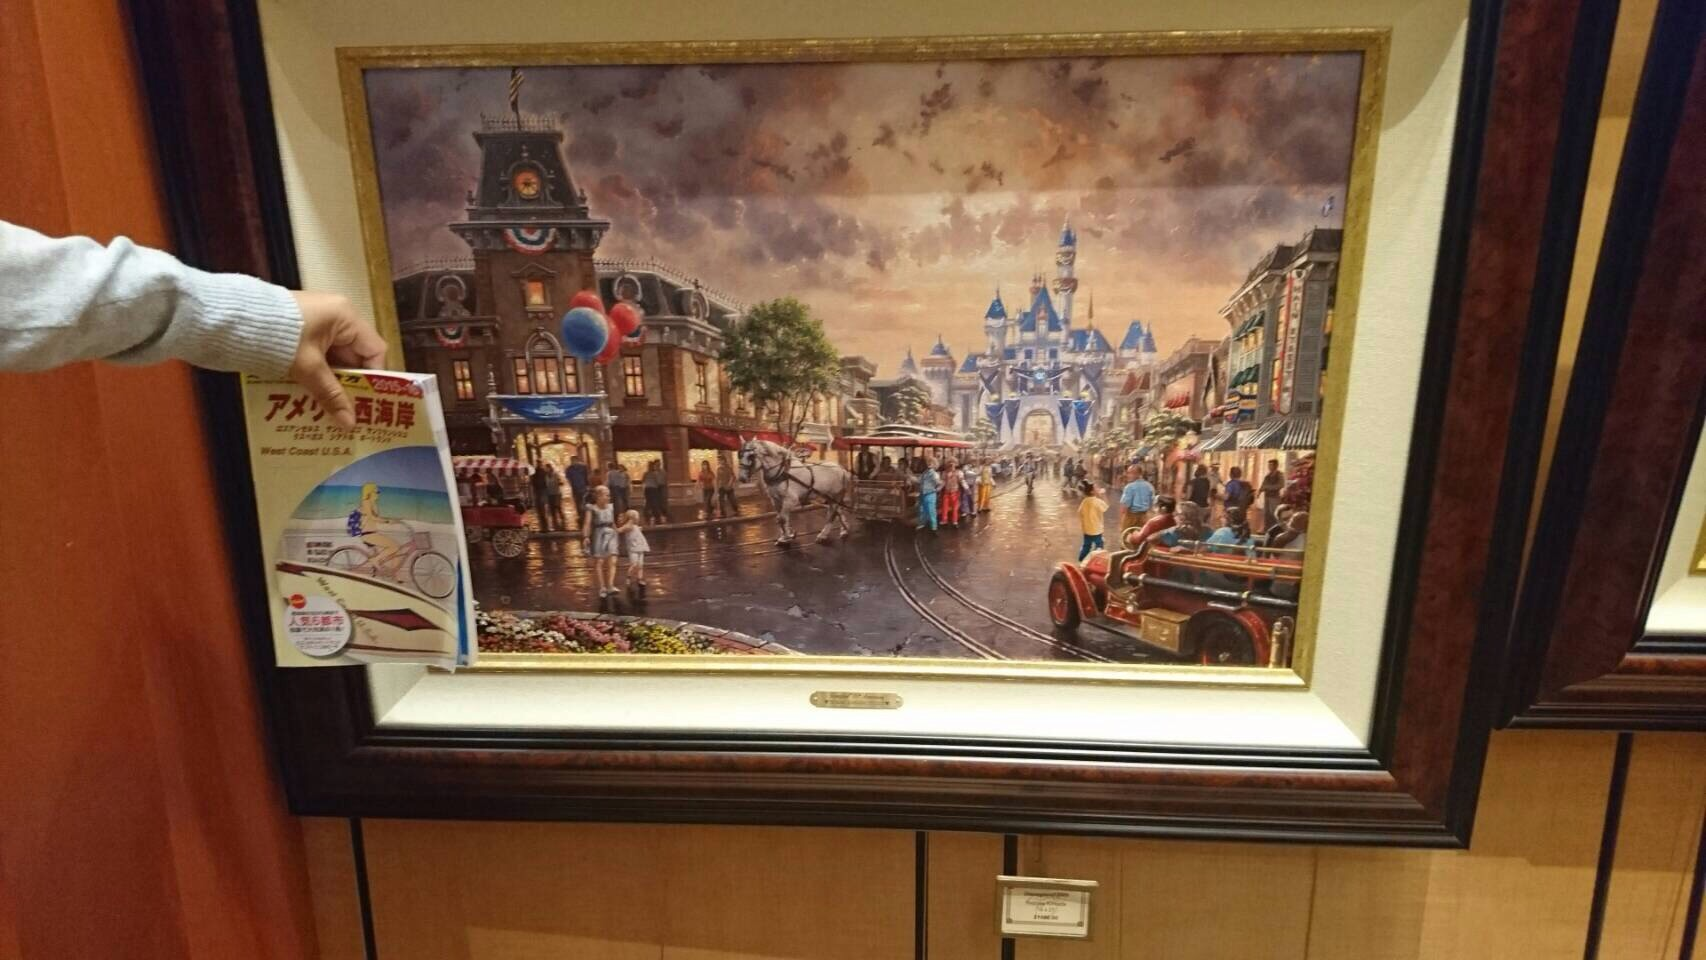 Disneyland ワールドオブディズニー ディズニーギャラリー 絵画 メインストリート 201609